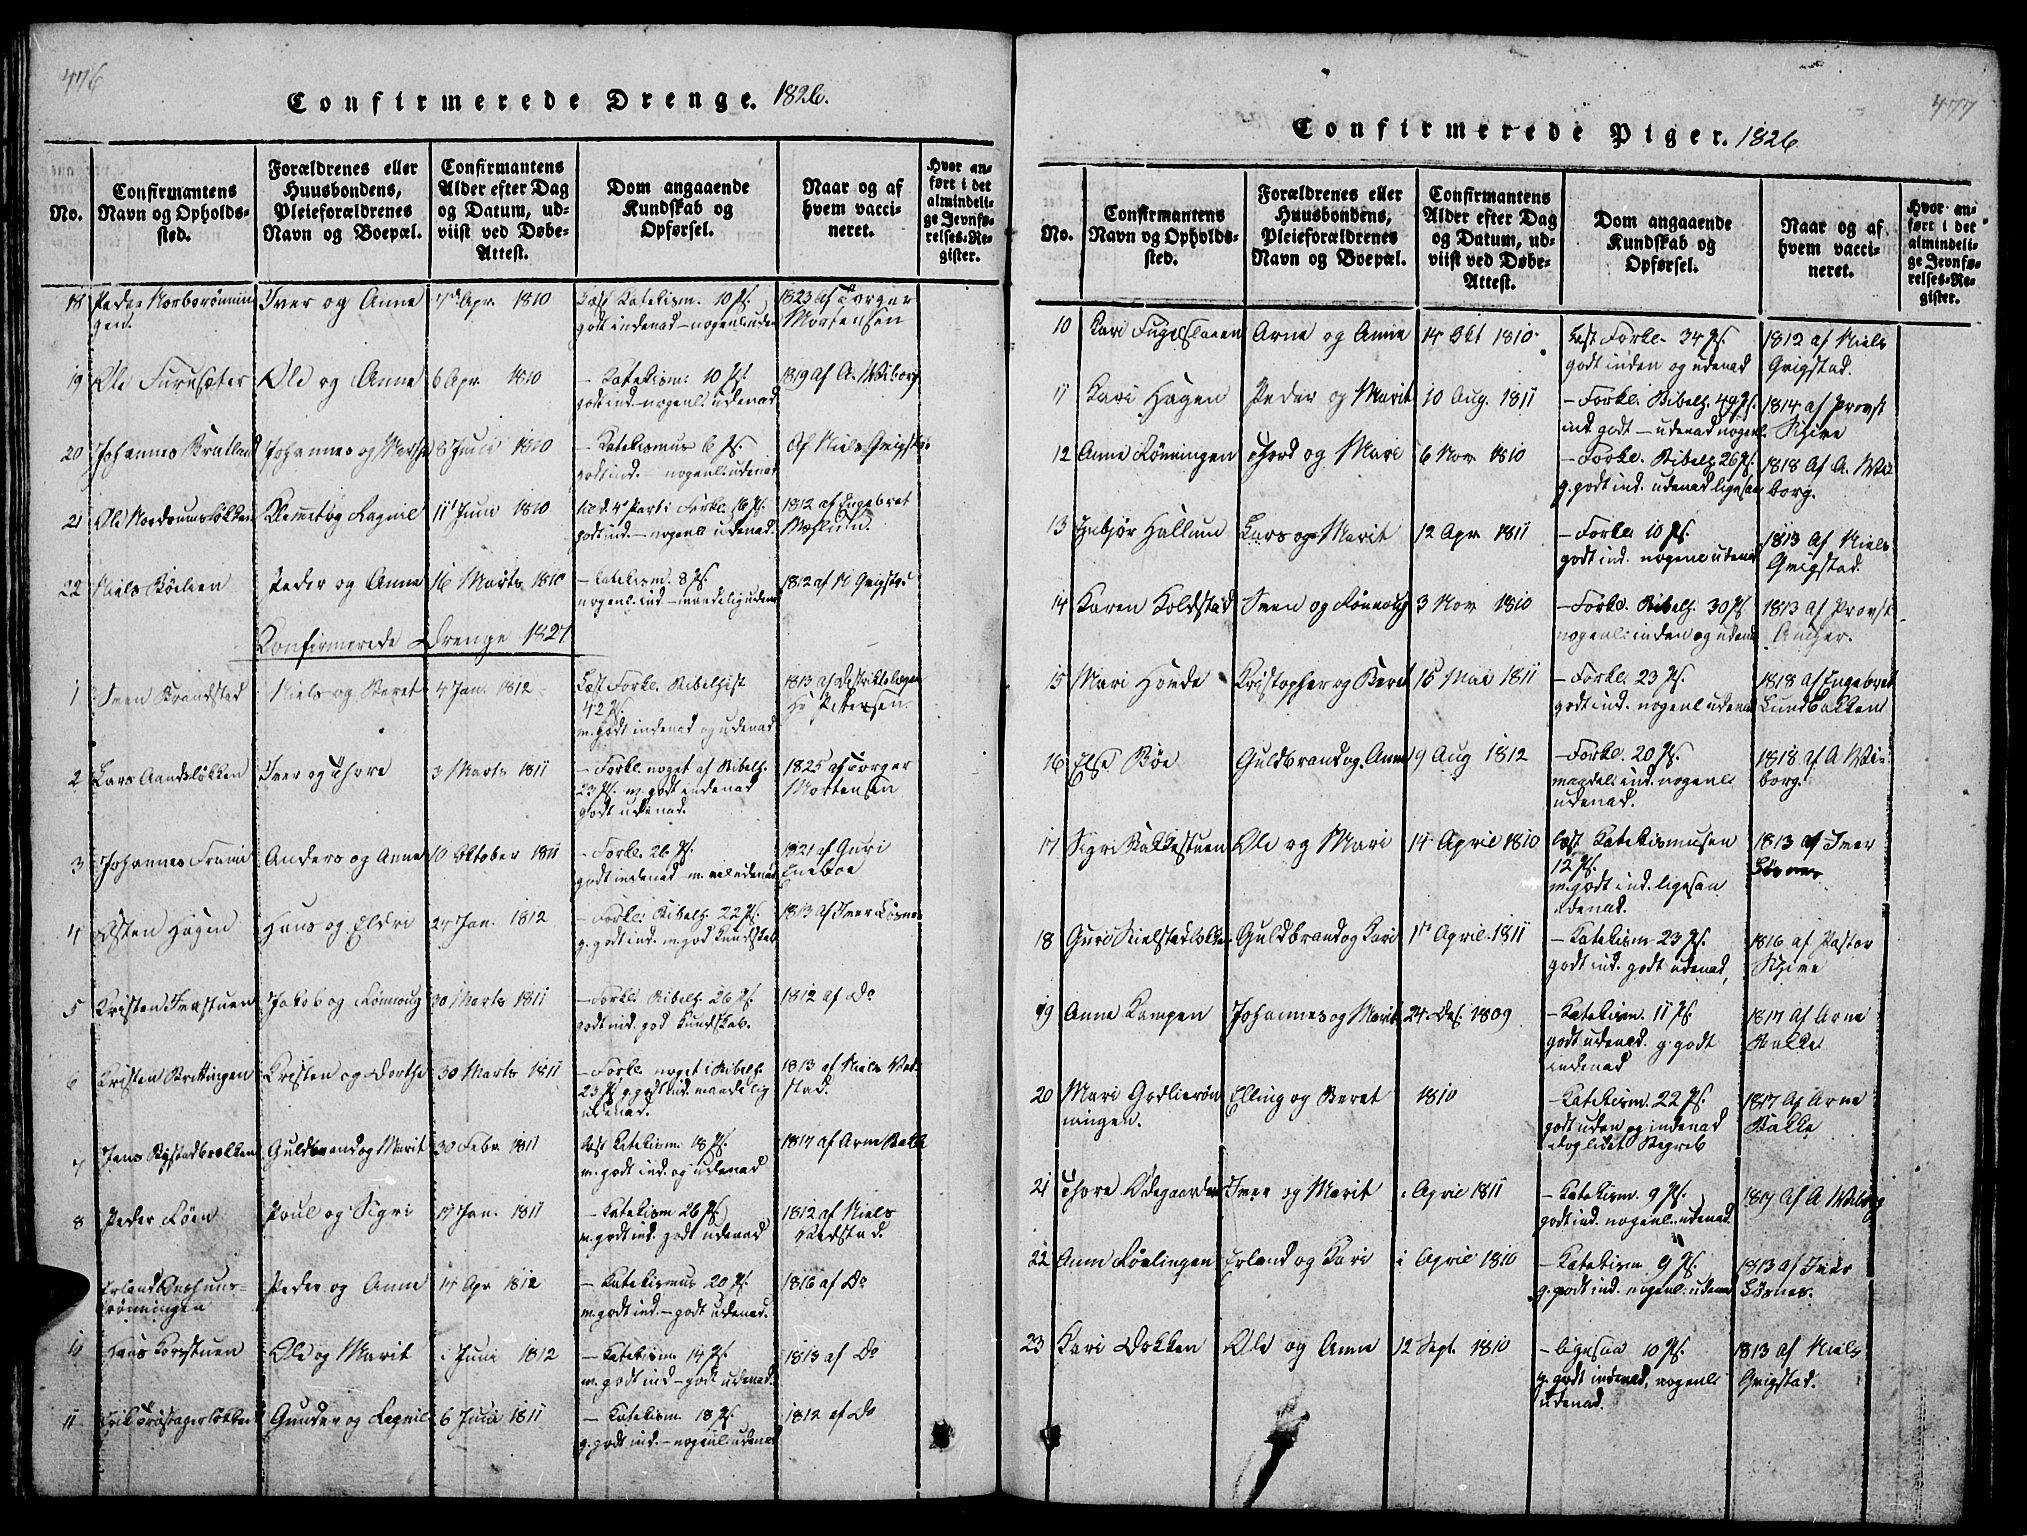 SAH, Ringebu prestekontor, Klokkerbok nr. 1, 1821-1839, s. 476-477